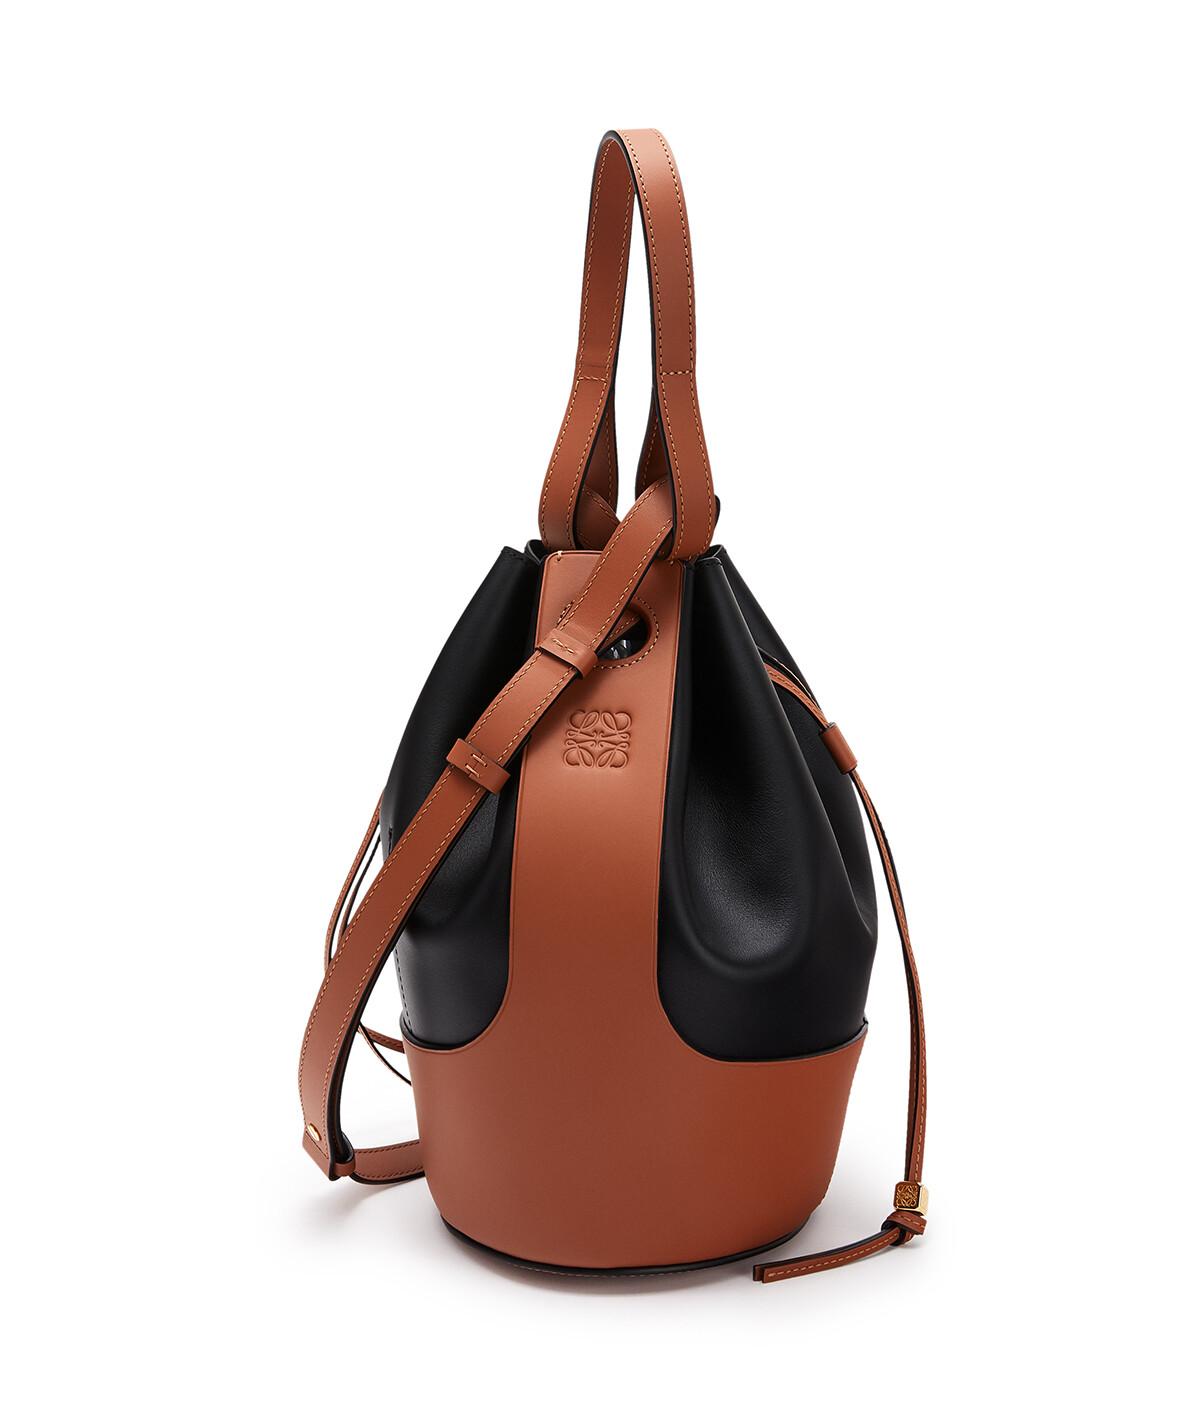 LOEWE Balloon Bag 黑色/棕褐色 front